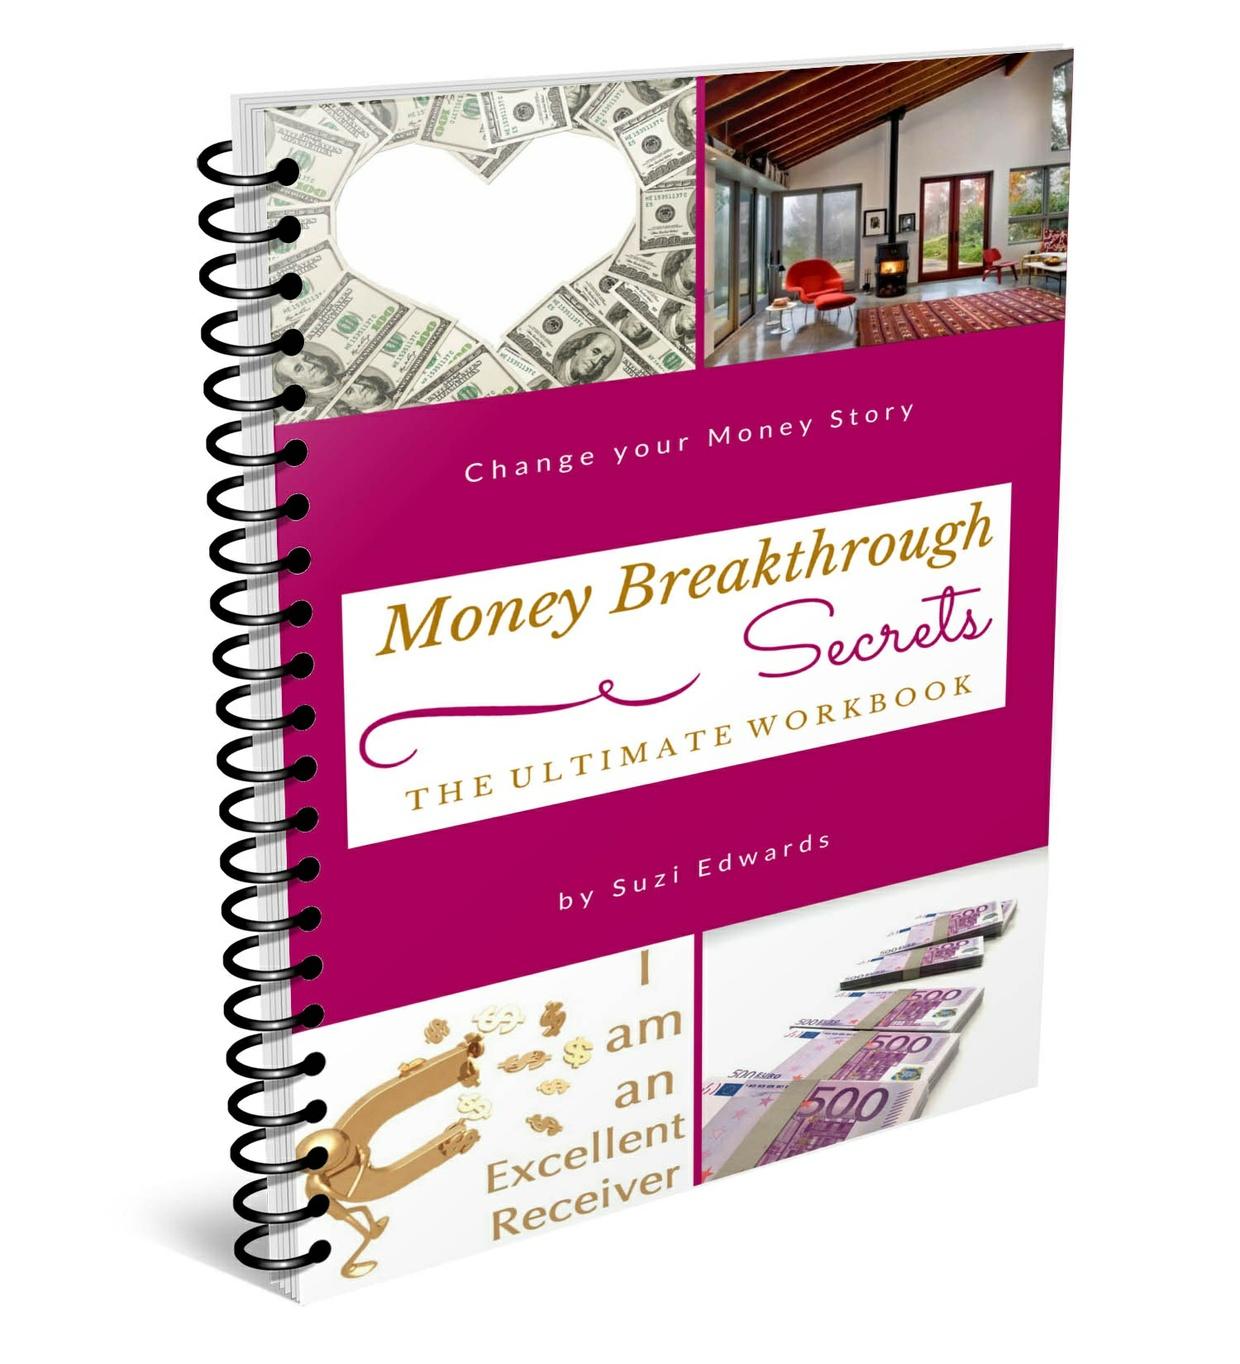 Money Breakthrough Secrets